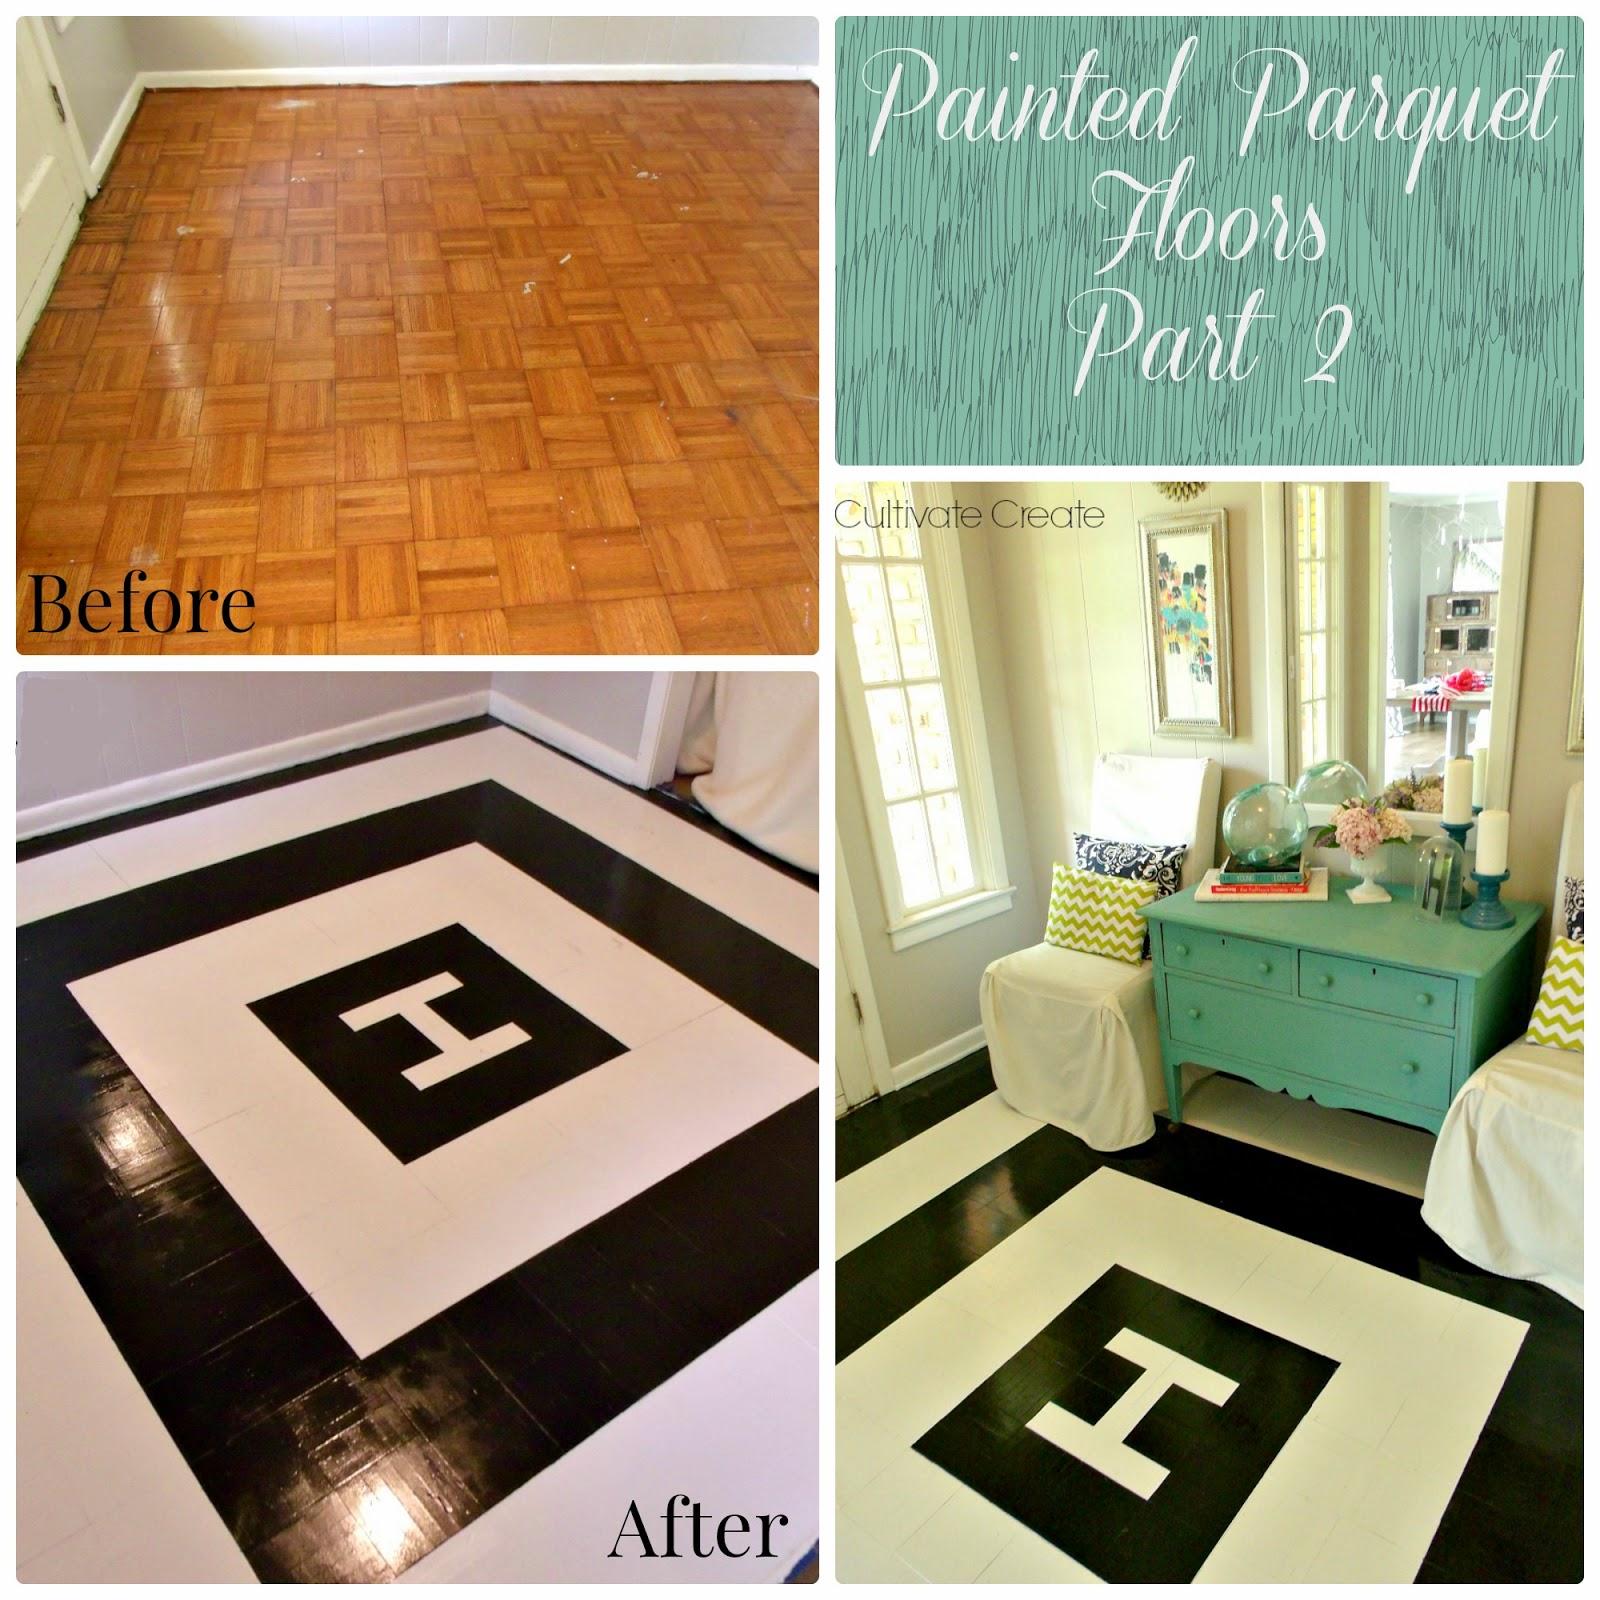 Cultivate create painted parquet floor part 2 - Painted parquet floor pictures ...